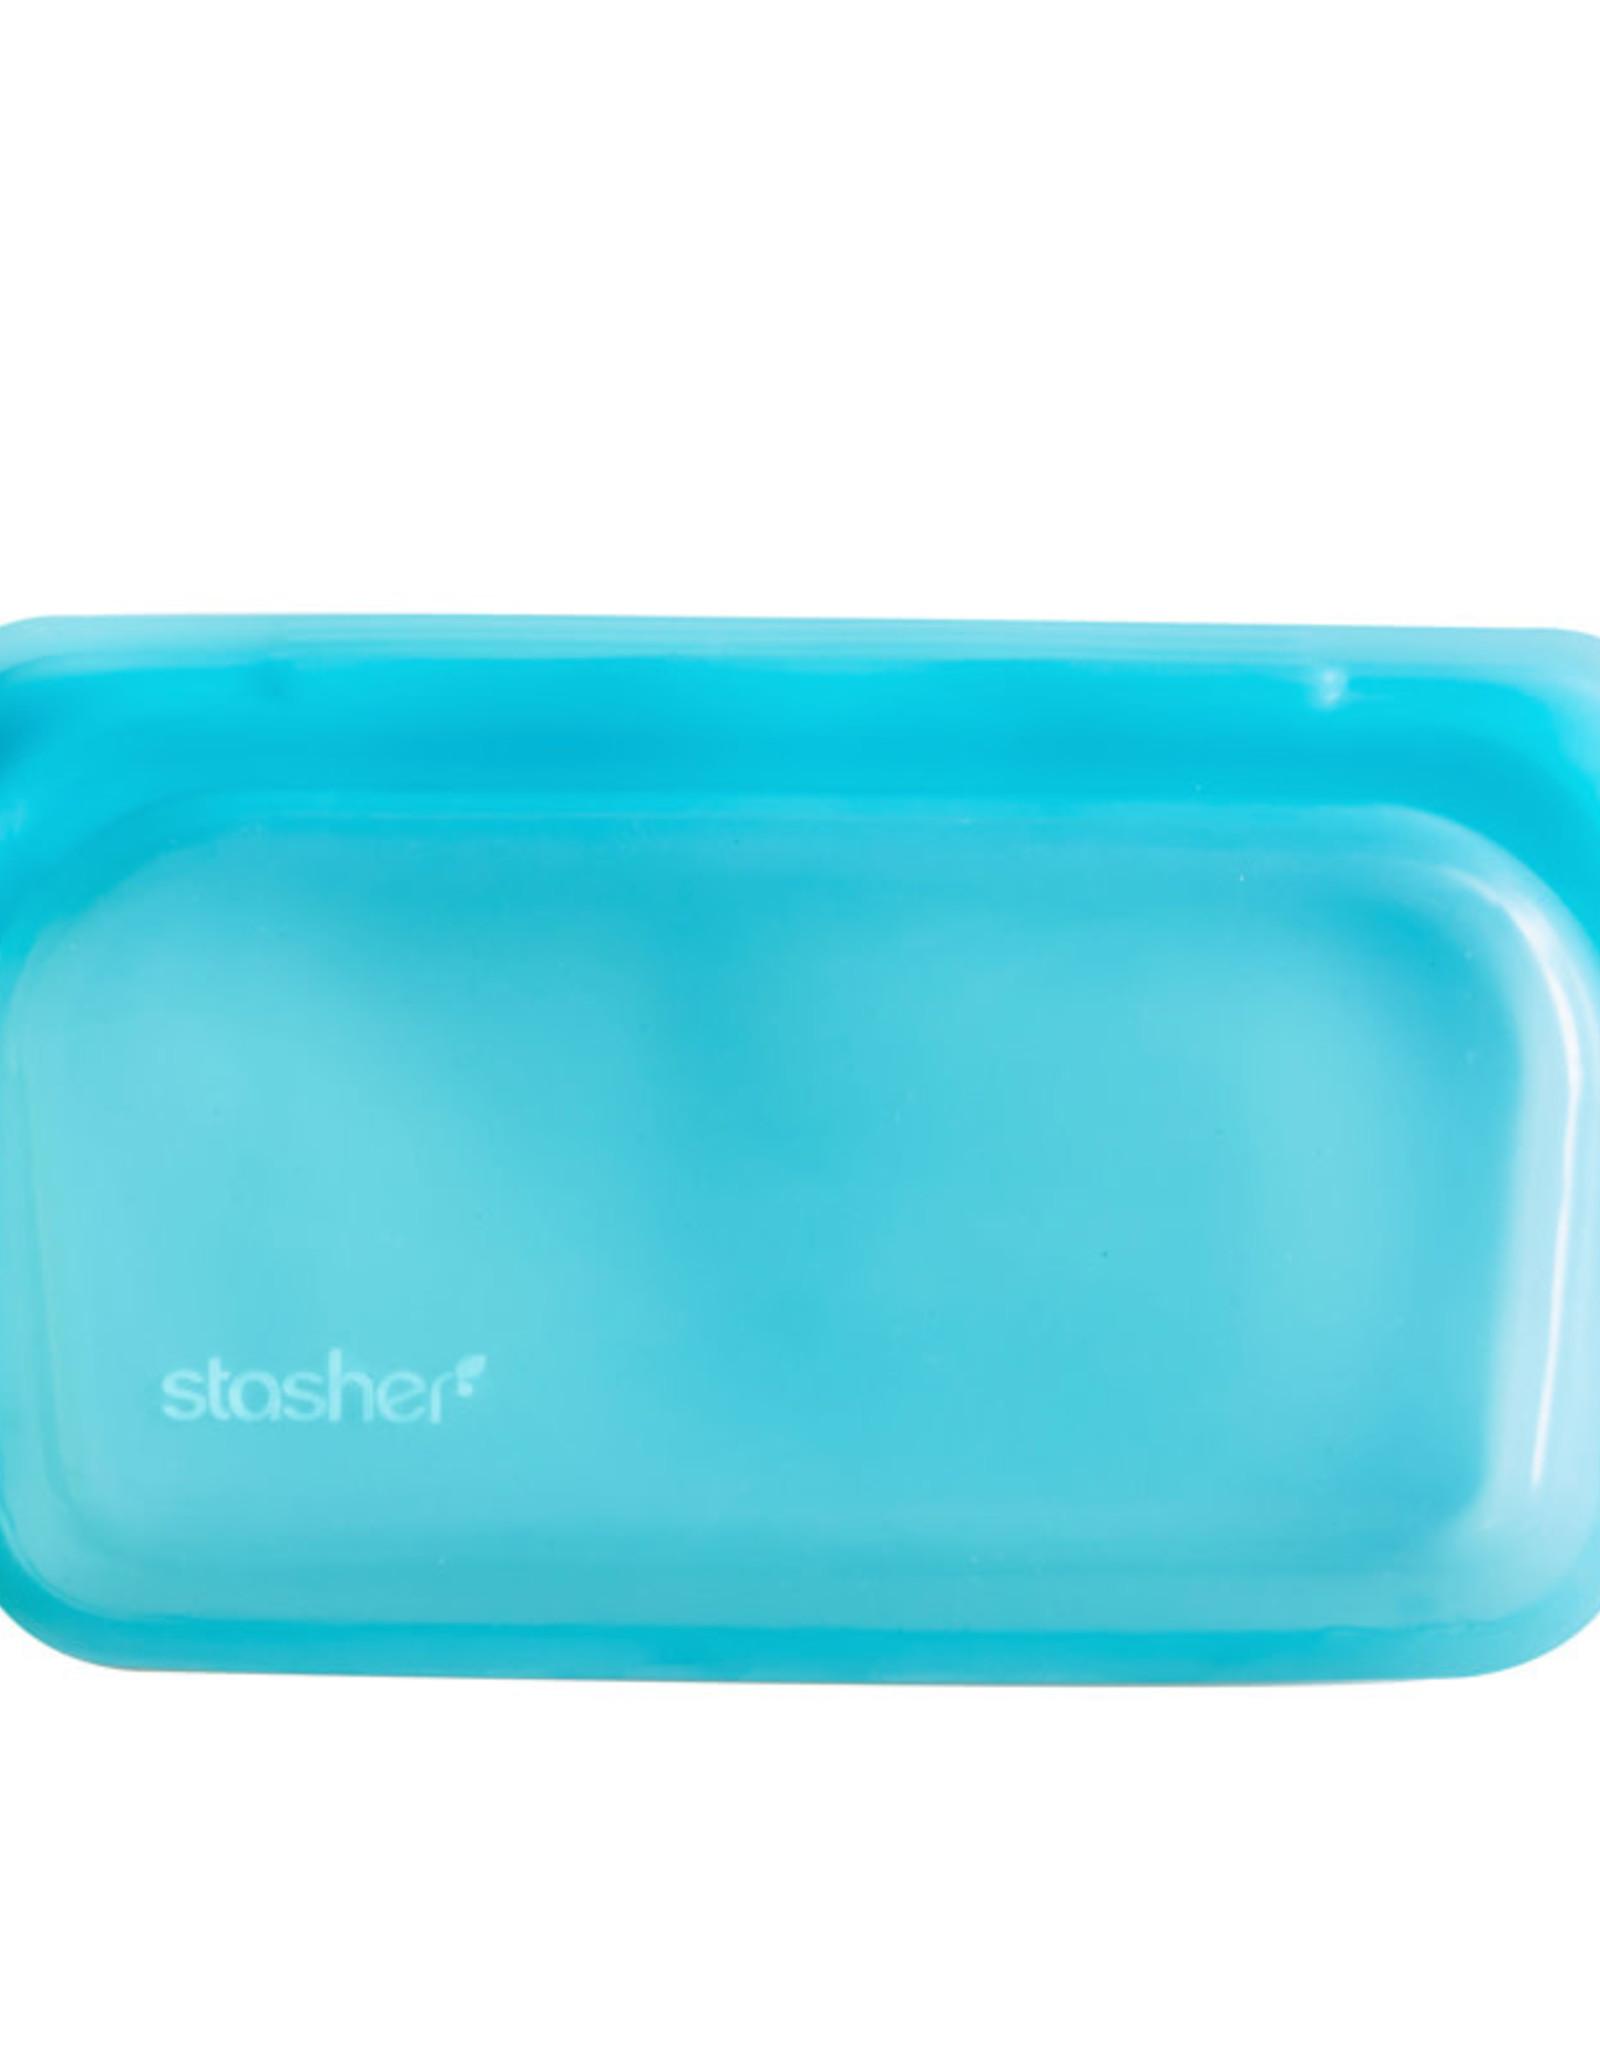 Stasher Sac à collation stasher Turquoise